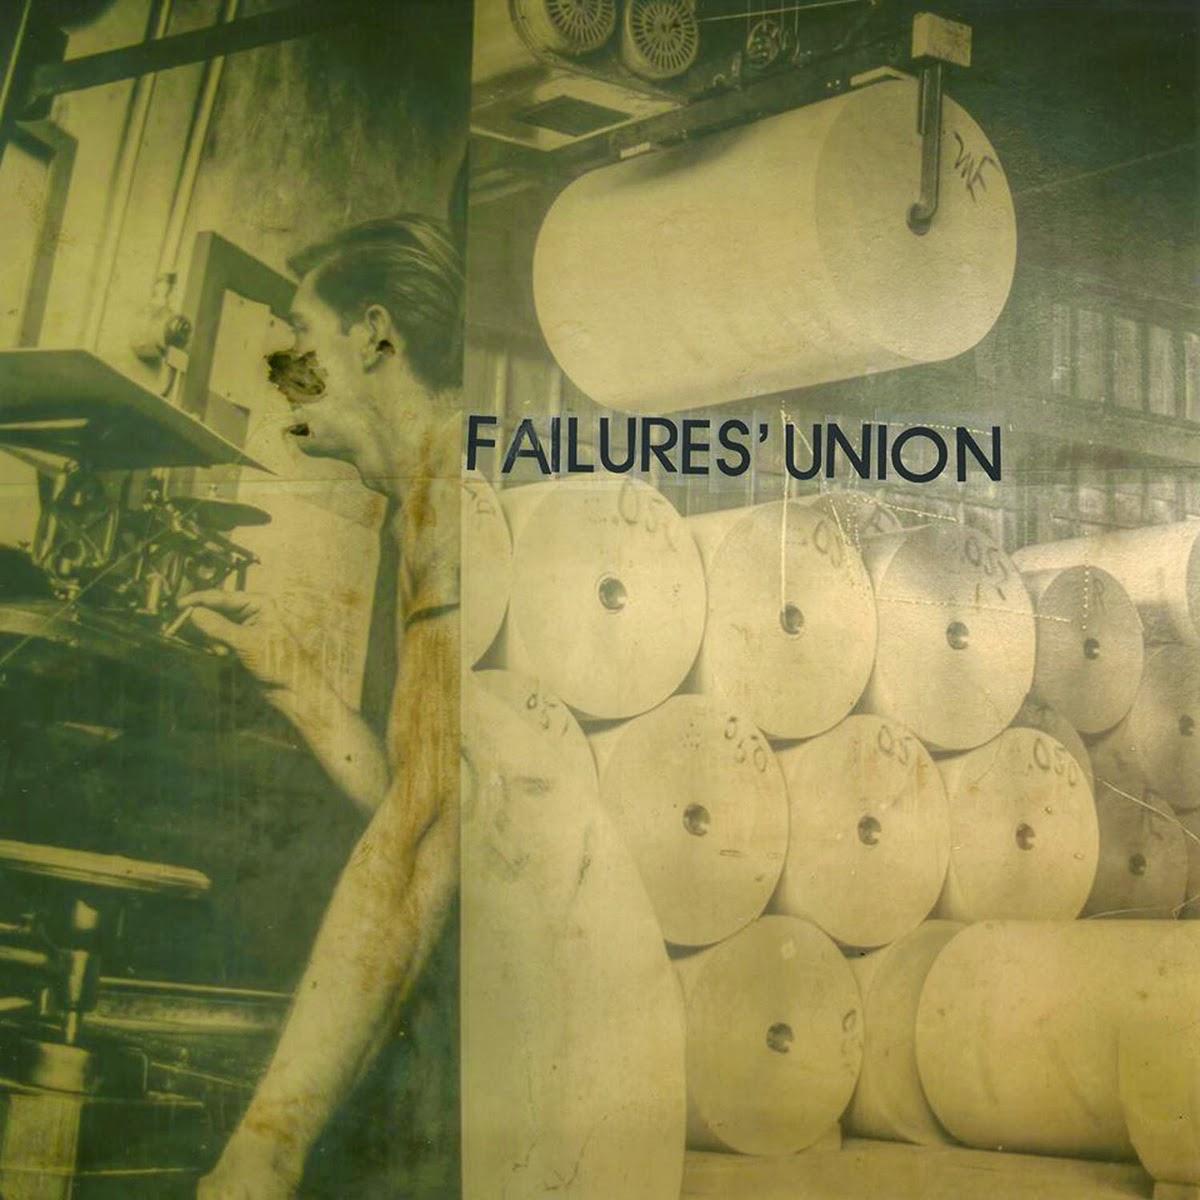 Failures' Union – Tethering